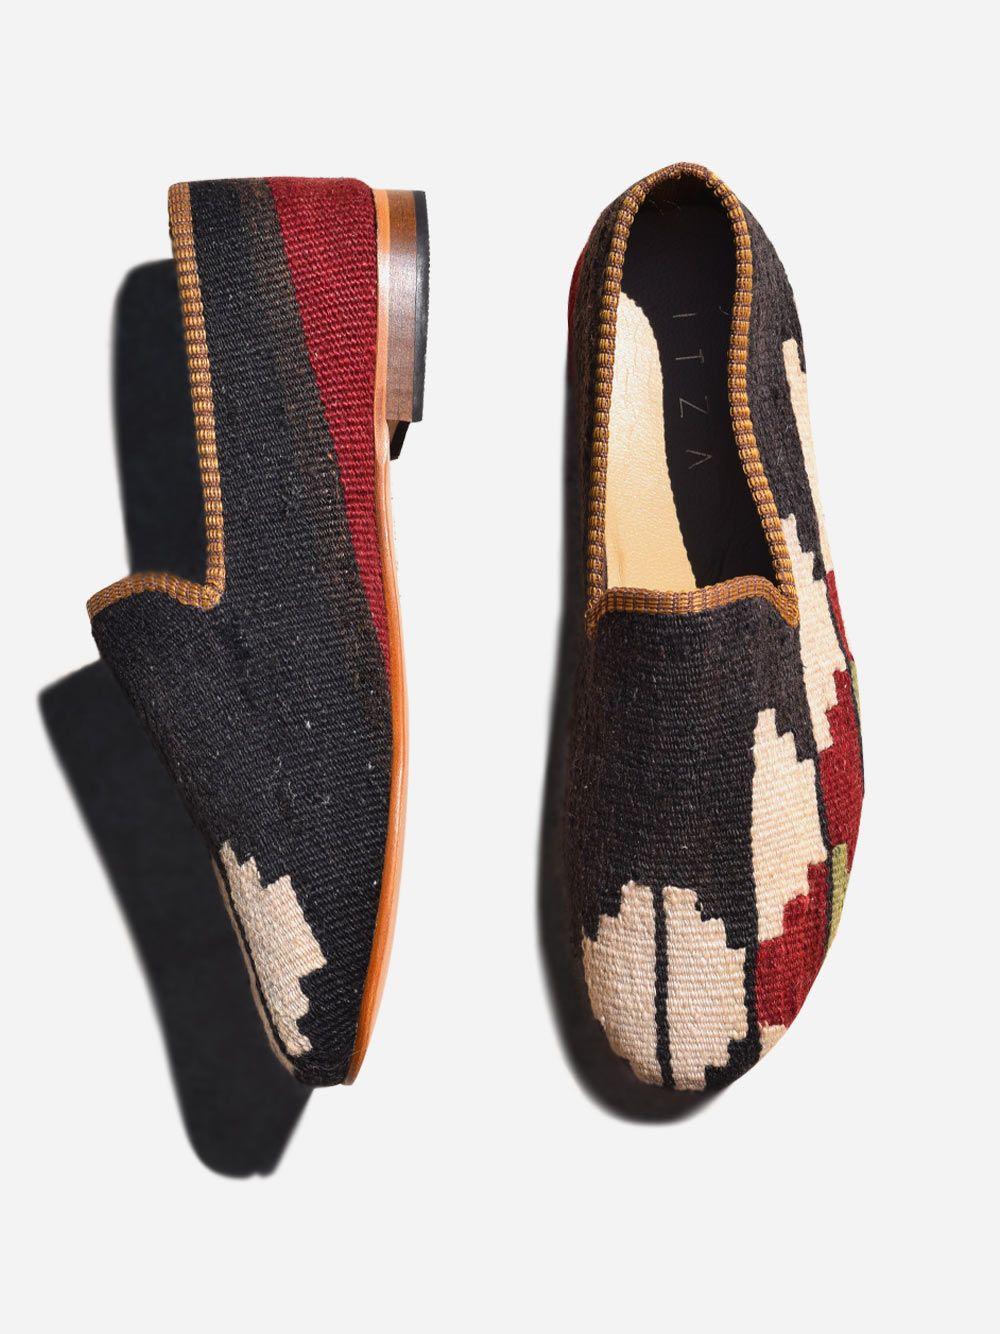 Loafer Padrão Sete | Itza